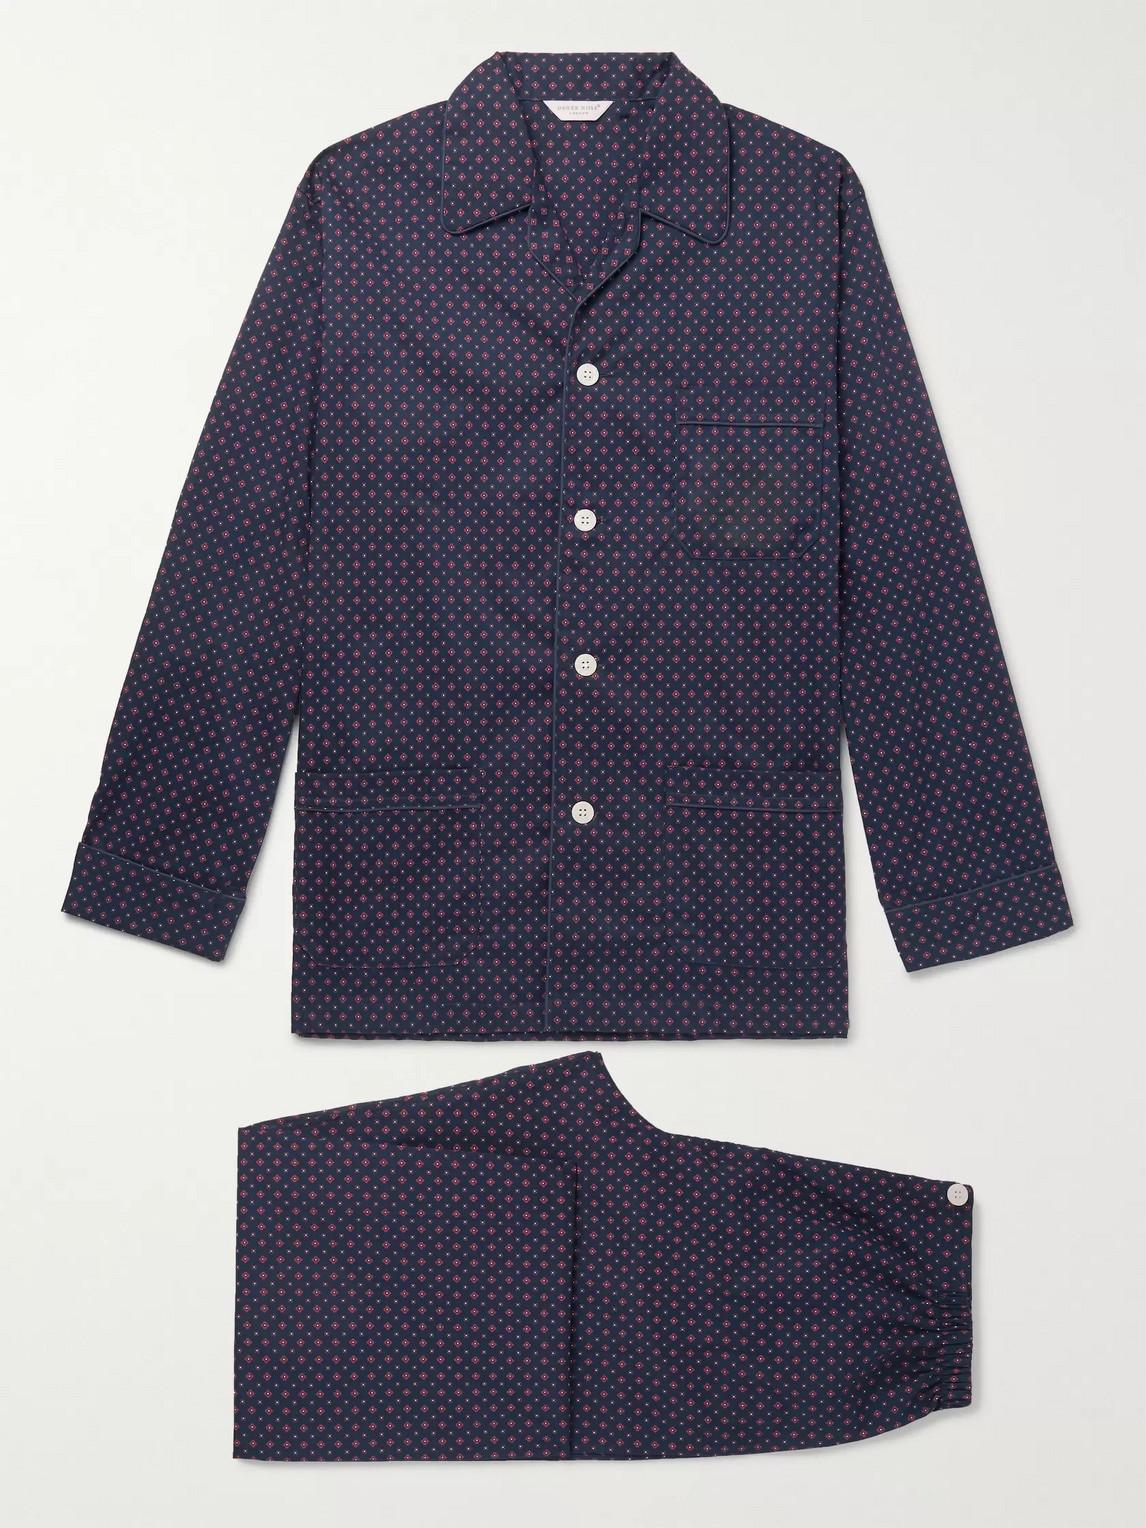 derek rose - nelson 72 printed cotton-poplin pyjama set - blue - xl - men